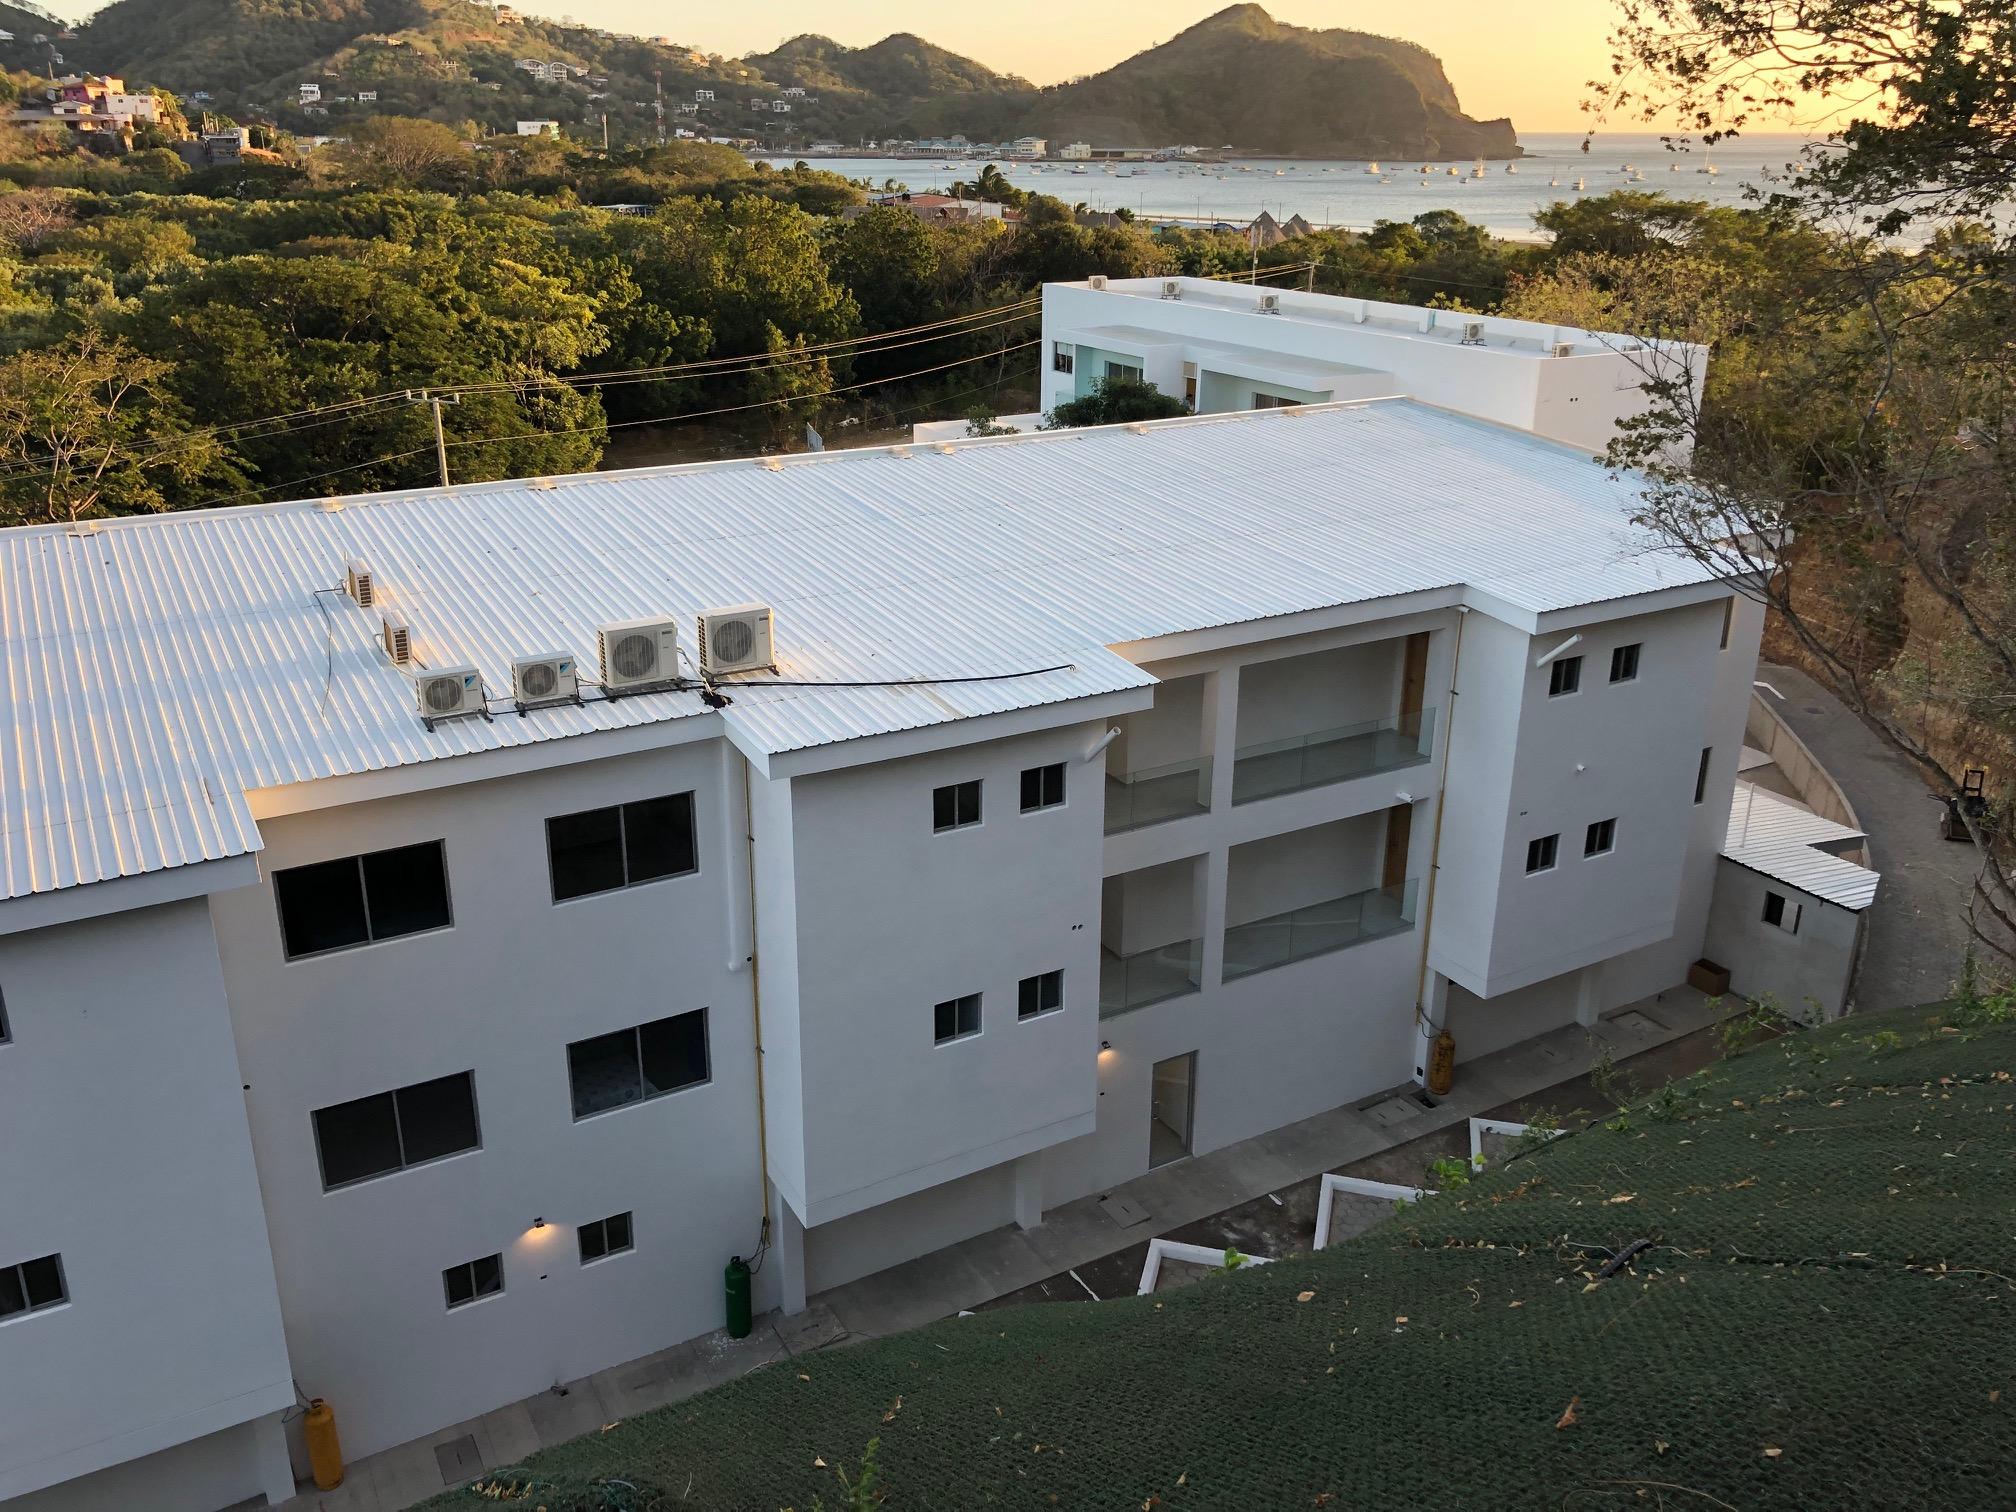 Real Estate For Nicaragua 2.jpg